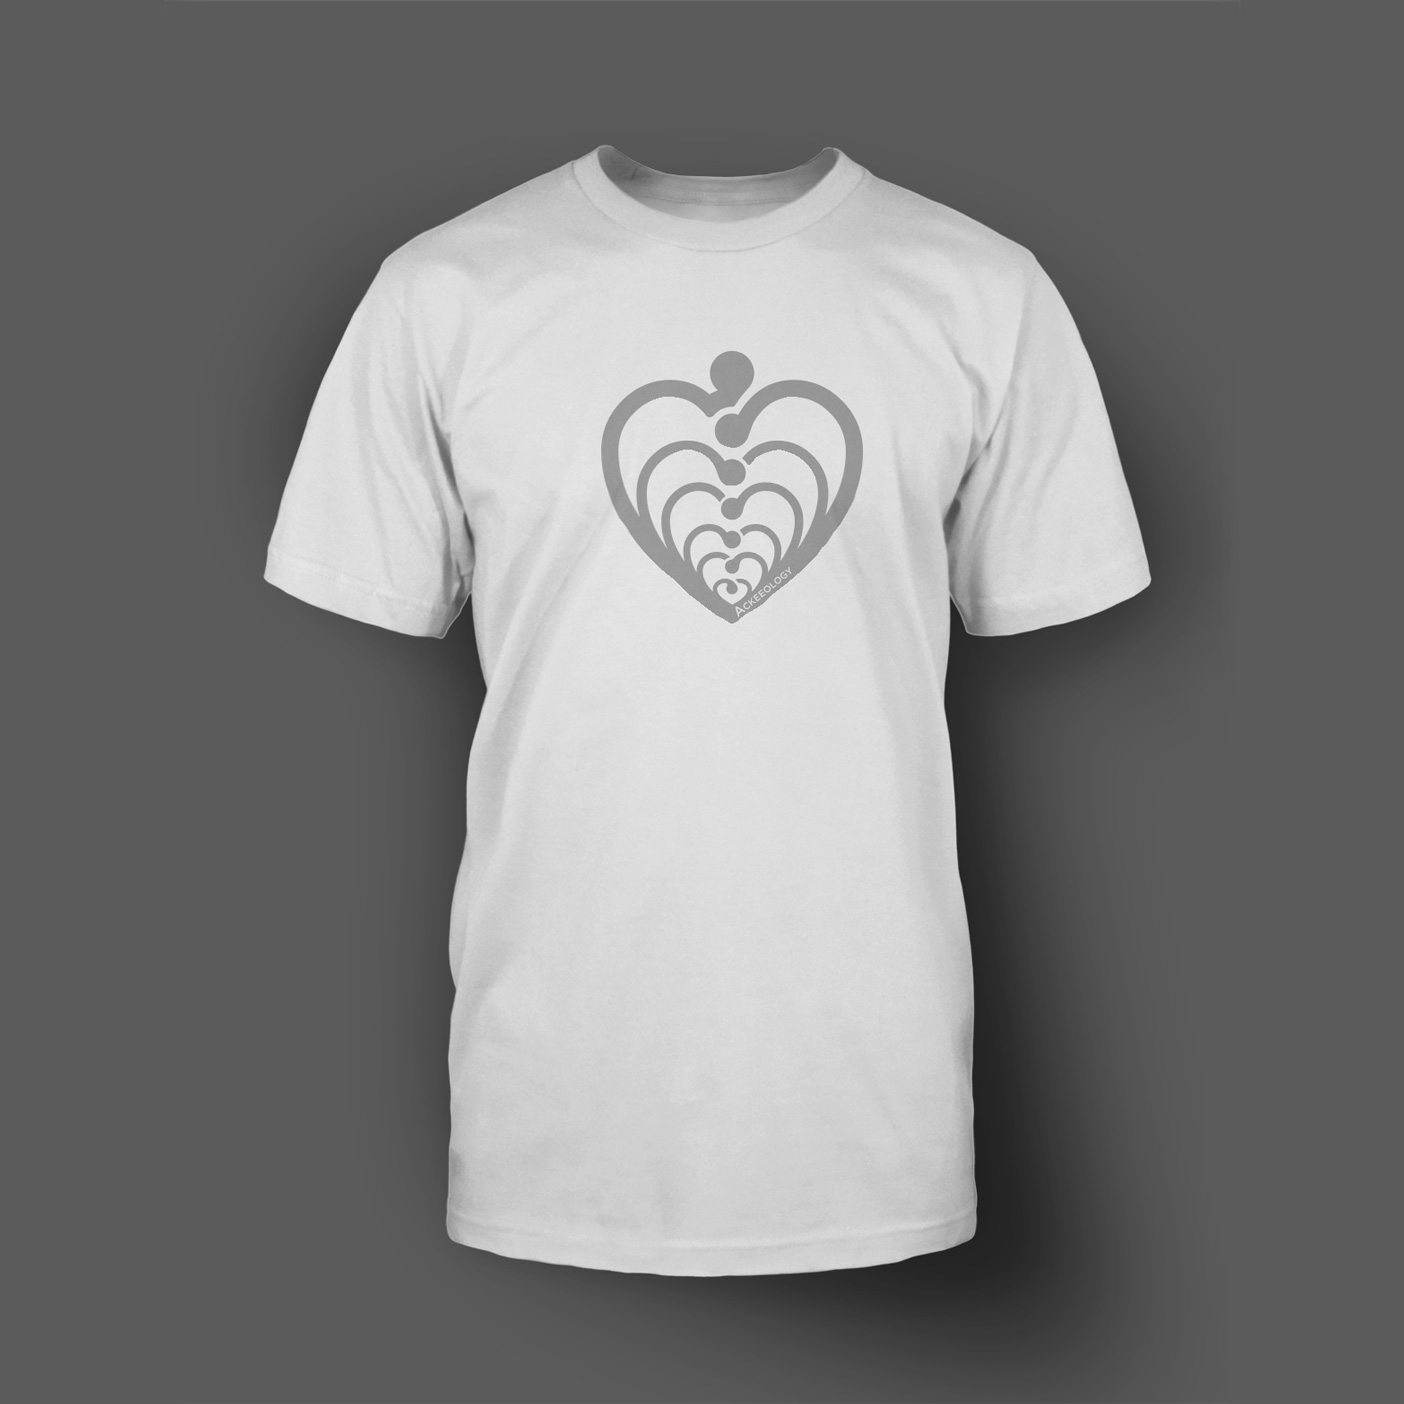 Infinite Heart: Ackeeology